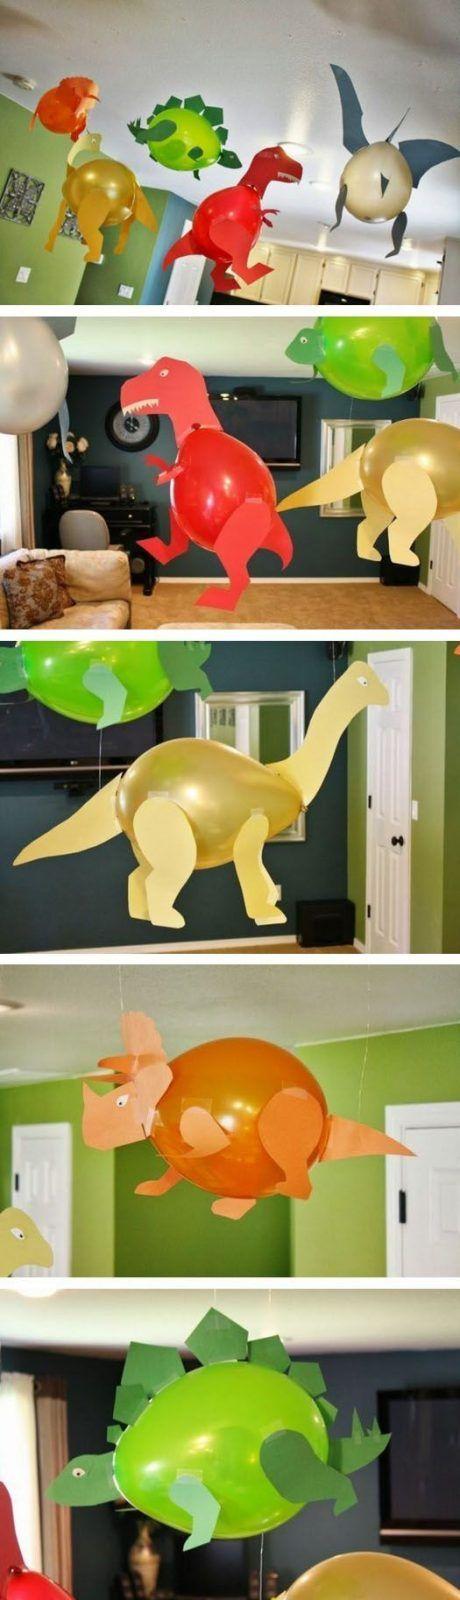 Geburtstagsparty DIY Deko - Kindergeburtstag -10+ Ideen Bastelideen Kinderparty Deko Dinoluftballons Luftballons Dinos